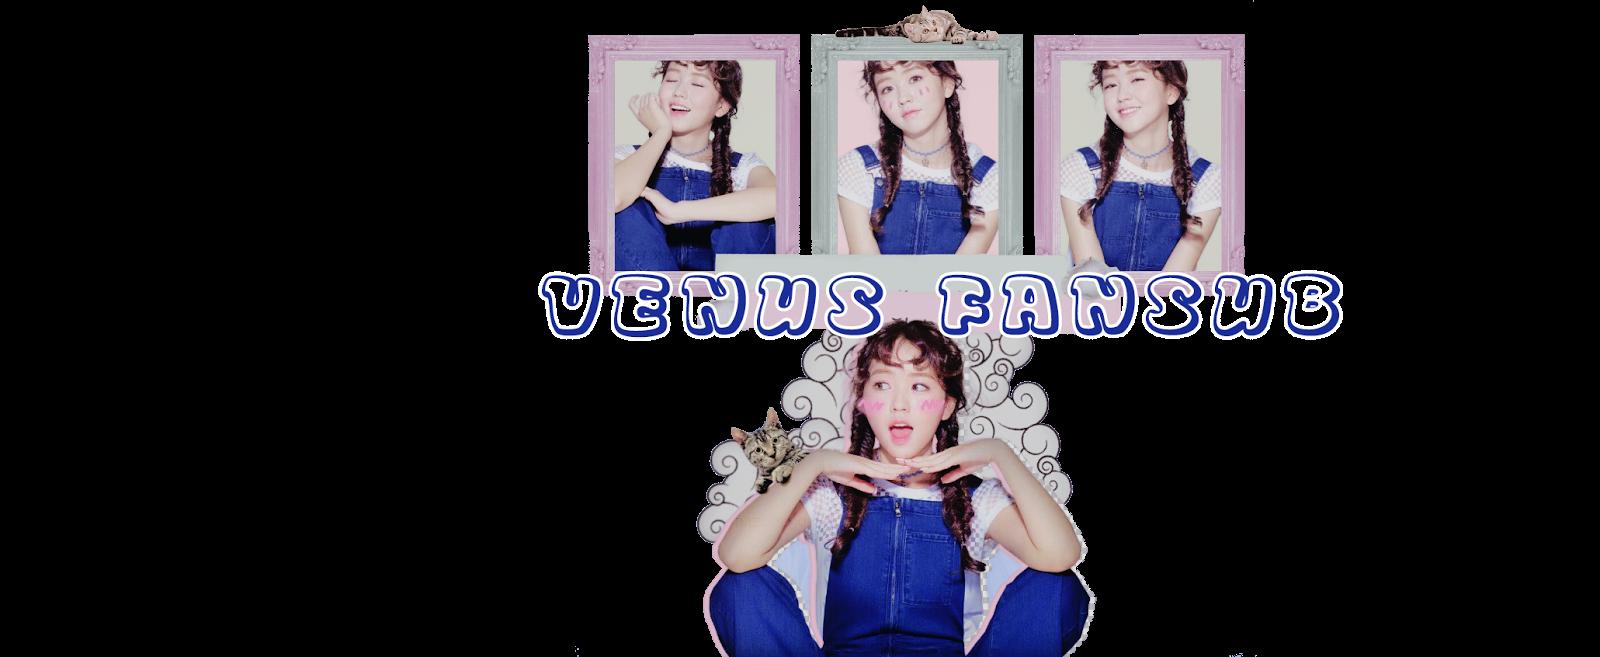 VenusFansub